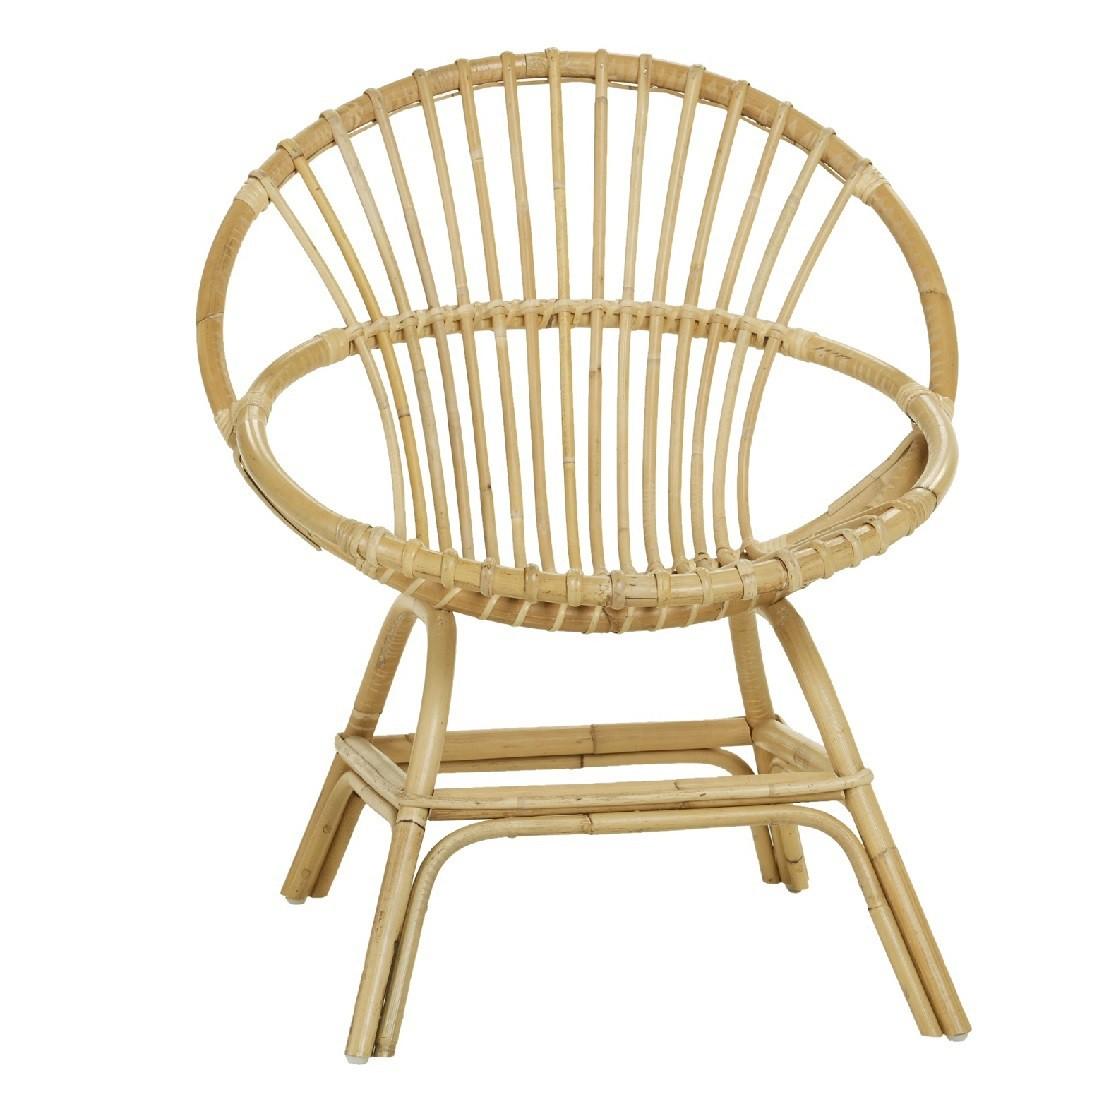 Fauteuil en rotin naturel Brigitte le fauteuil coquille de KOK